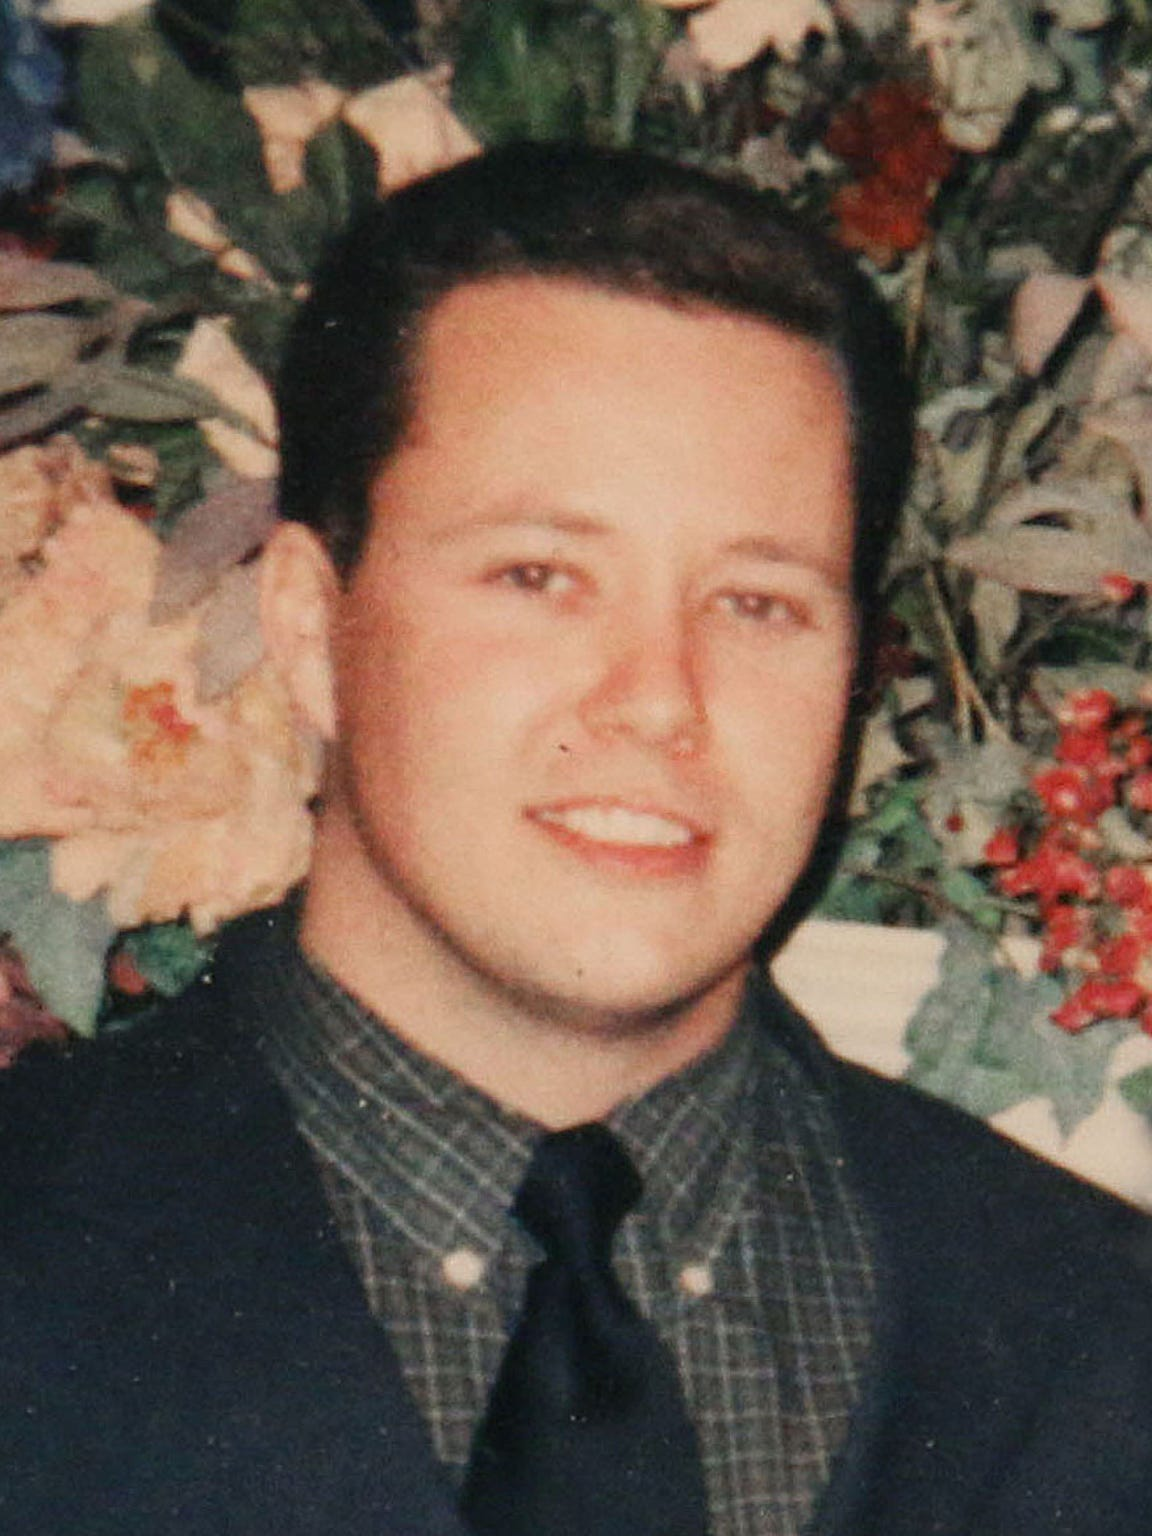 In 2014, Leonard Boldman died of a heroin overdose.